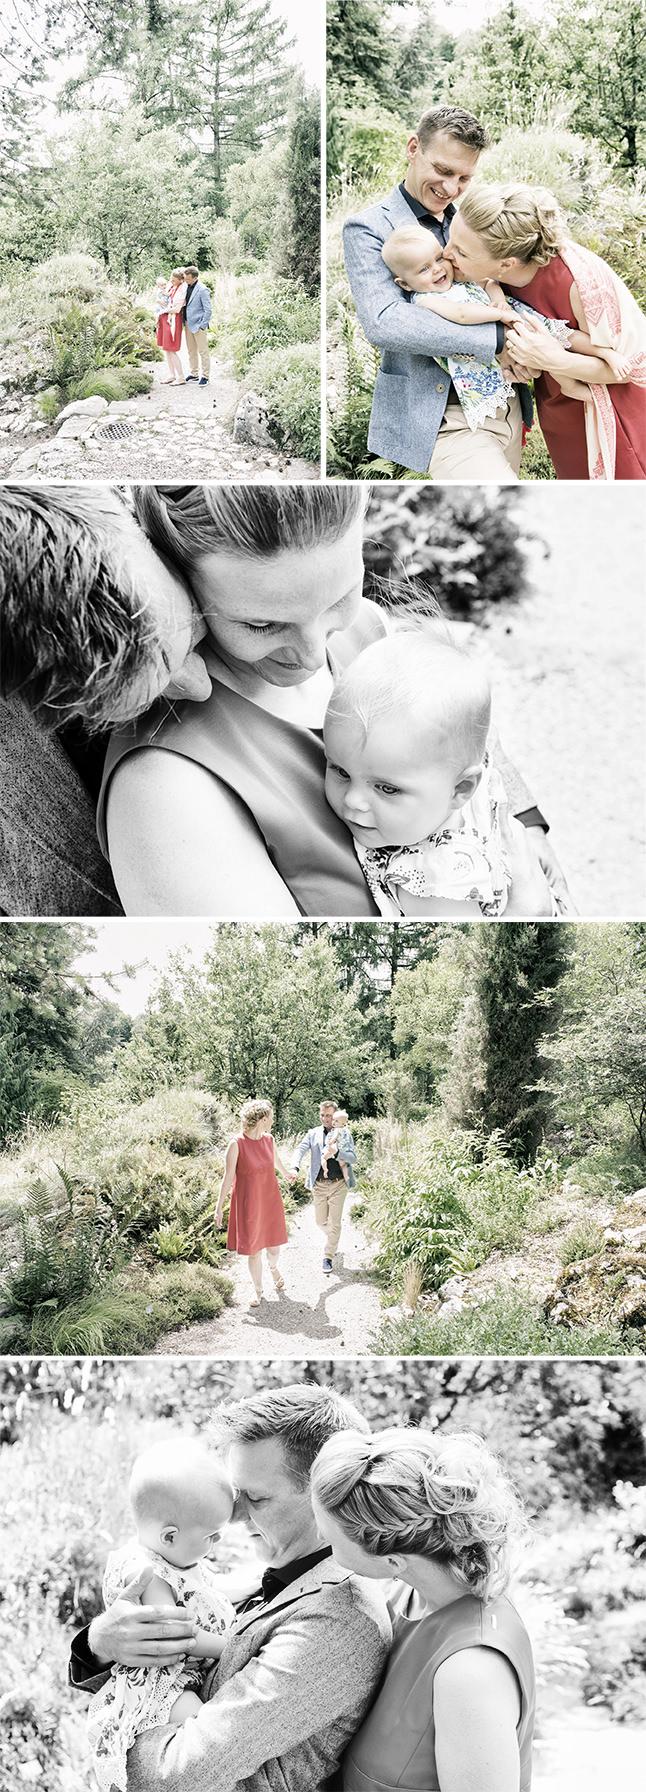 Familienshooting Daniela&Dinu_Fotos Noemi Tirro